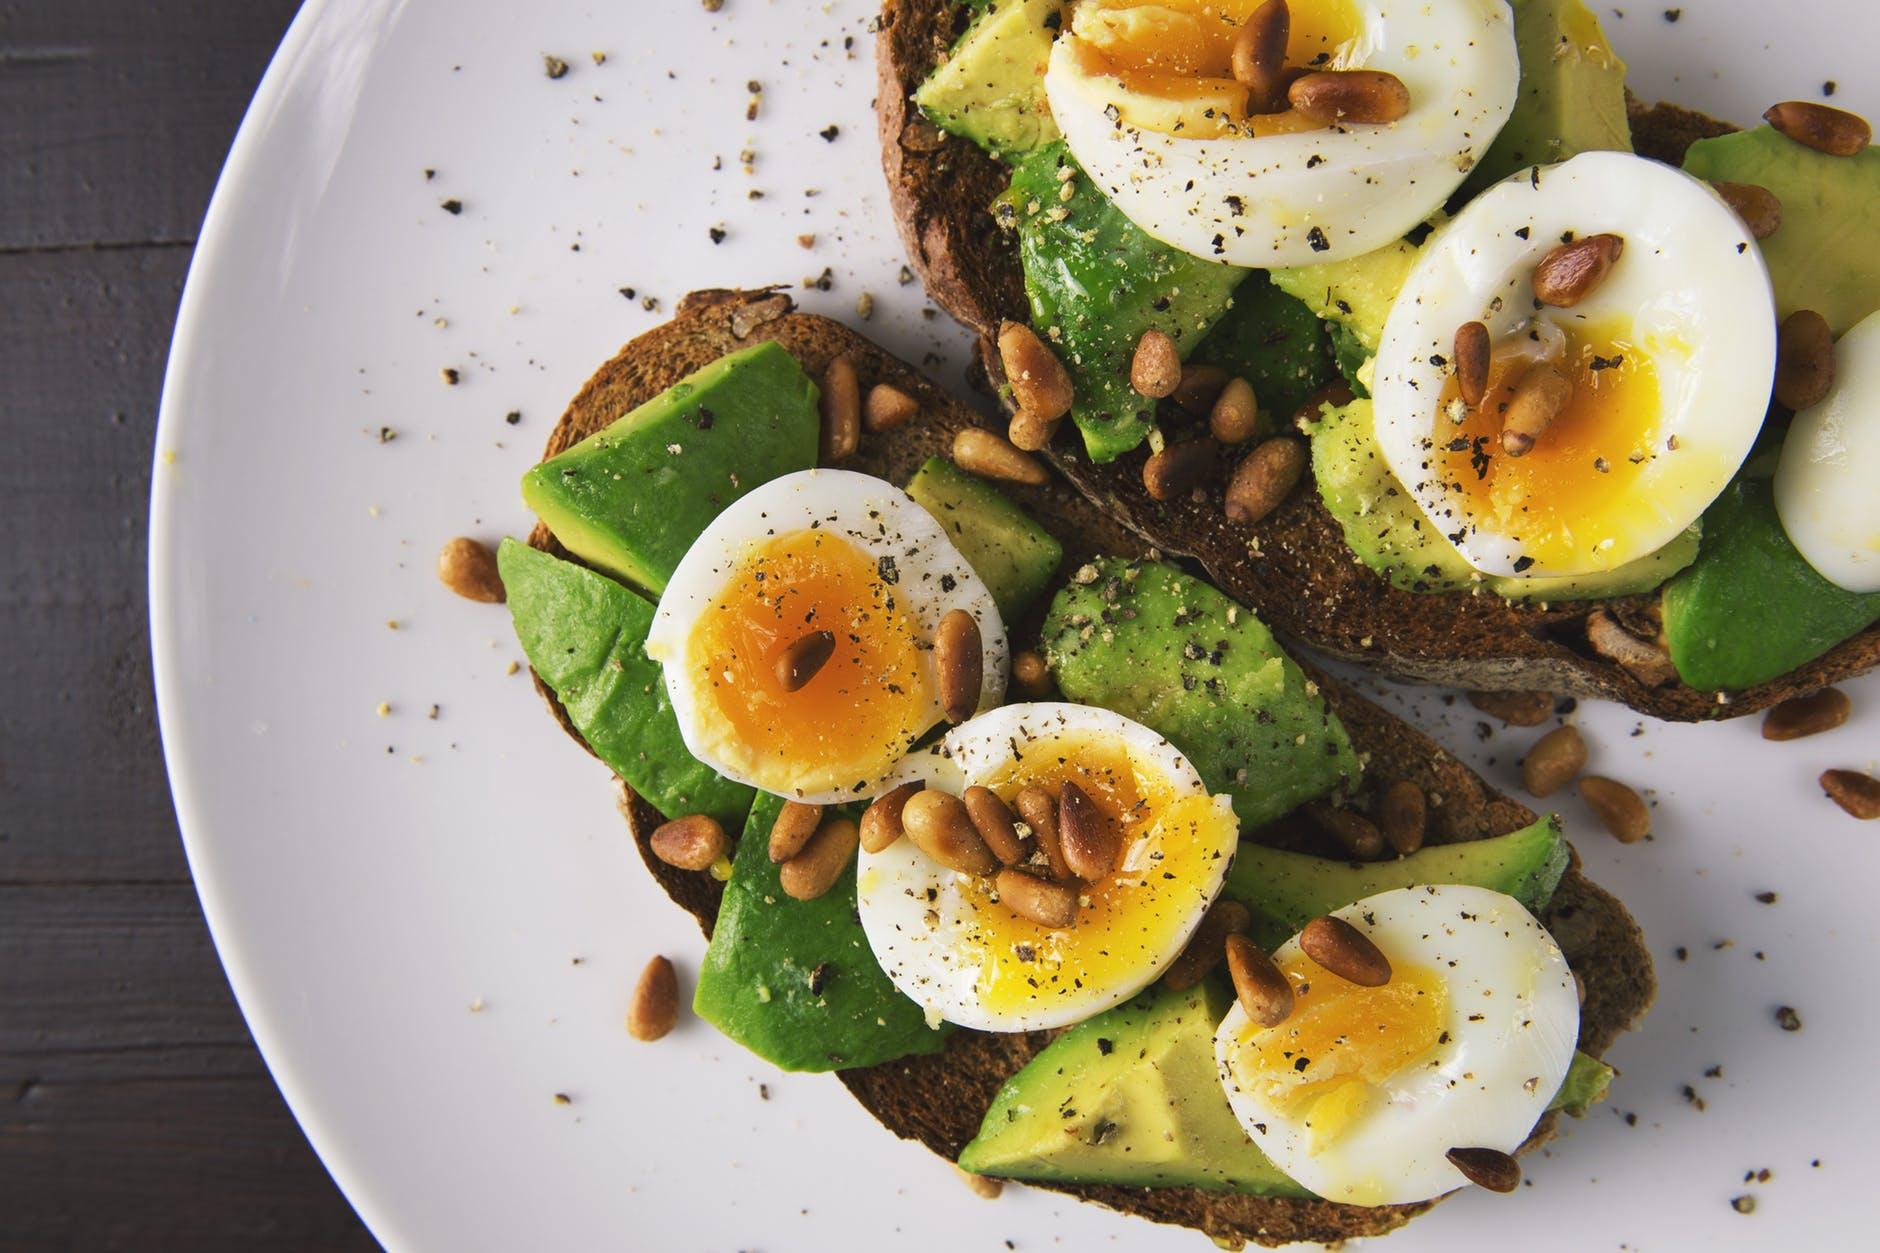 Healthy Food Period Advice Natural Eggs Avocado